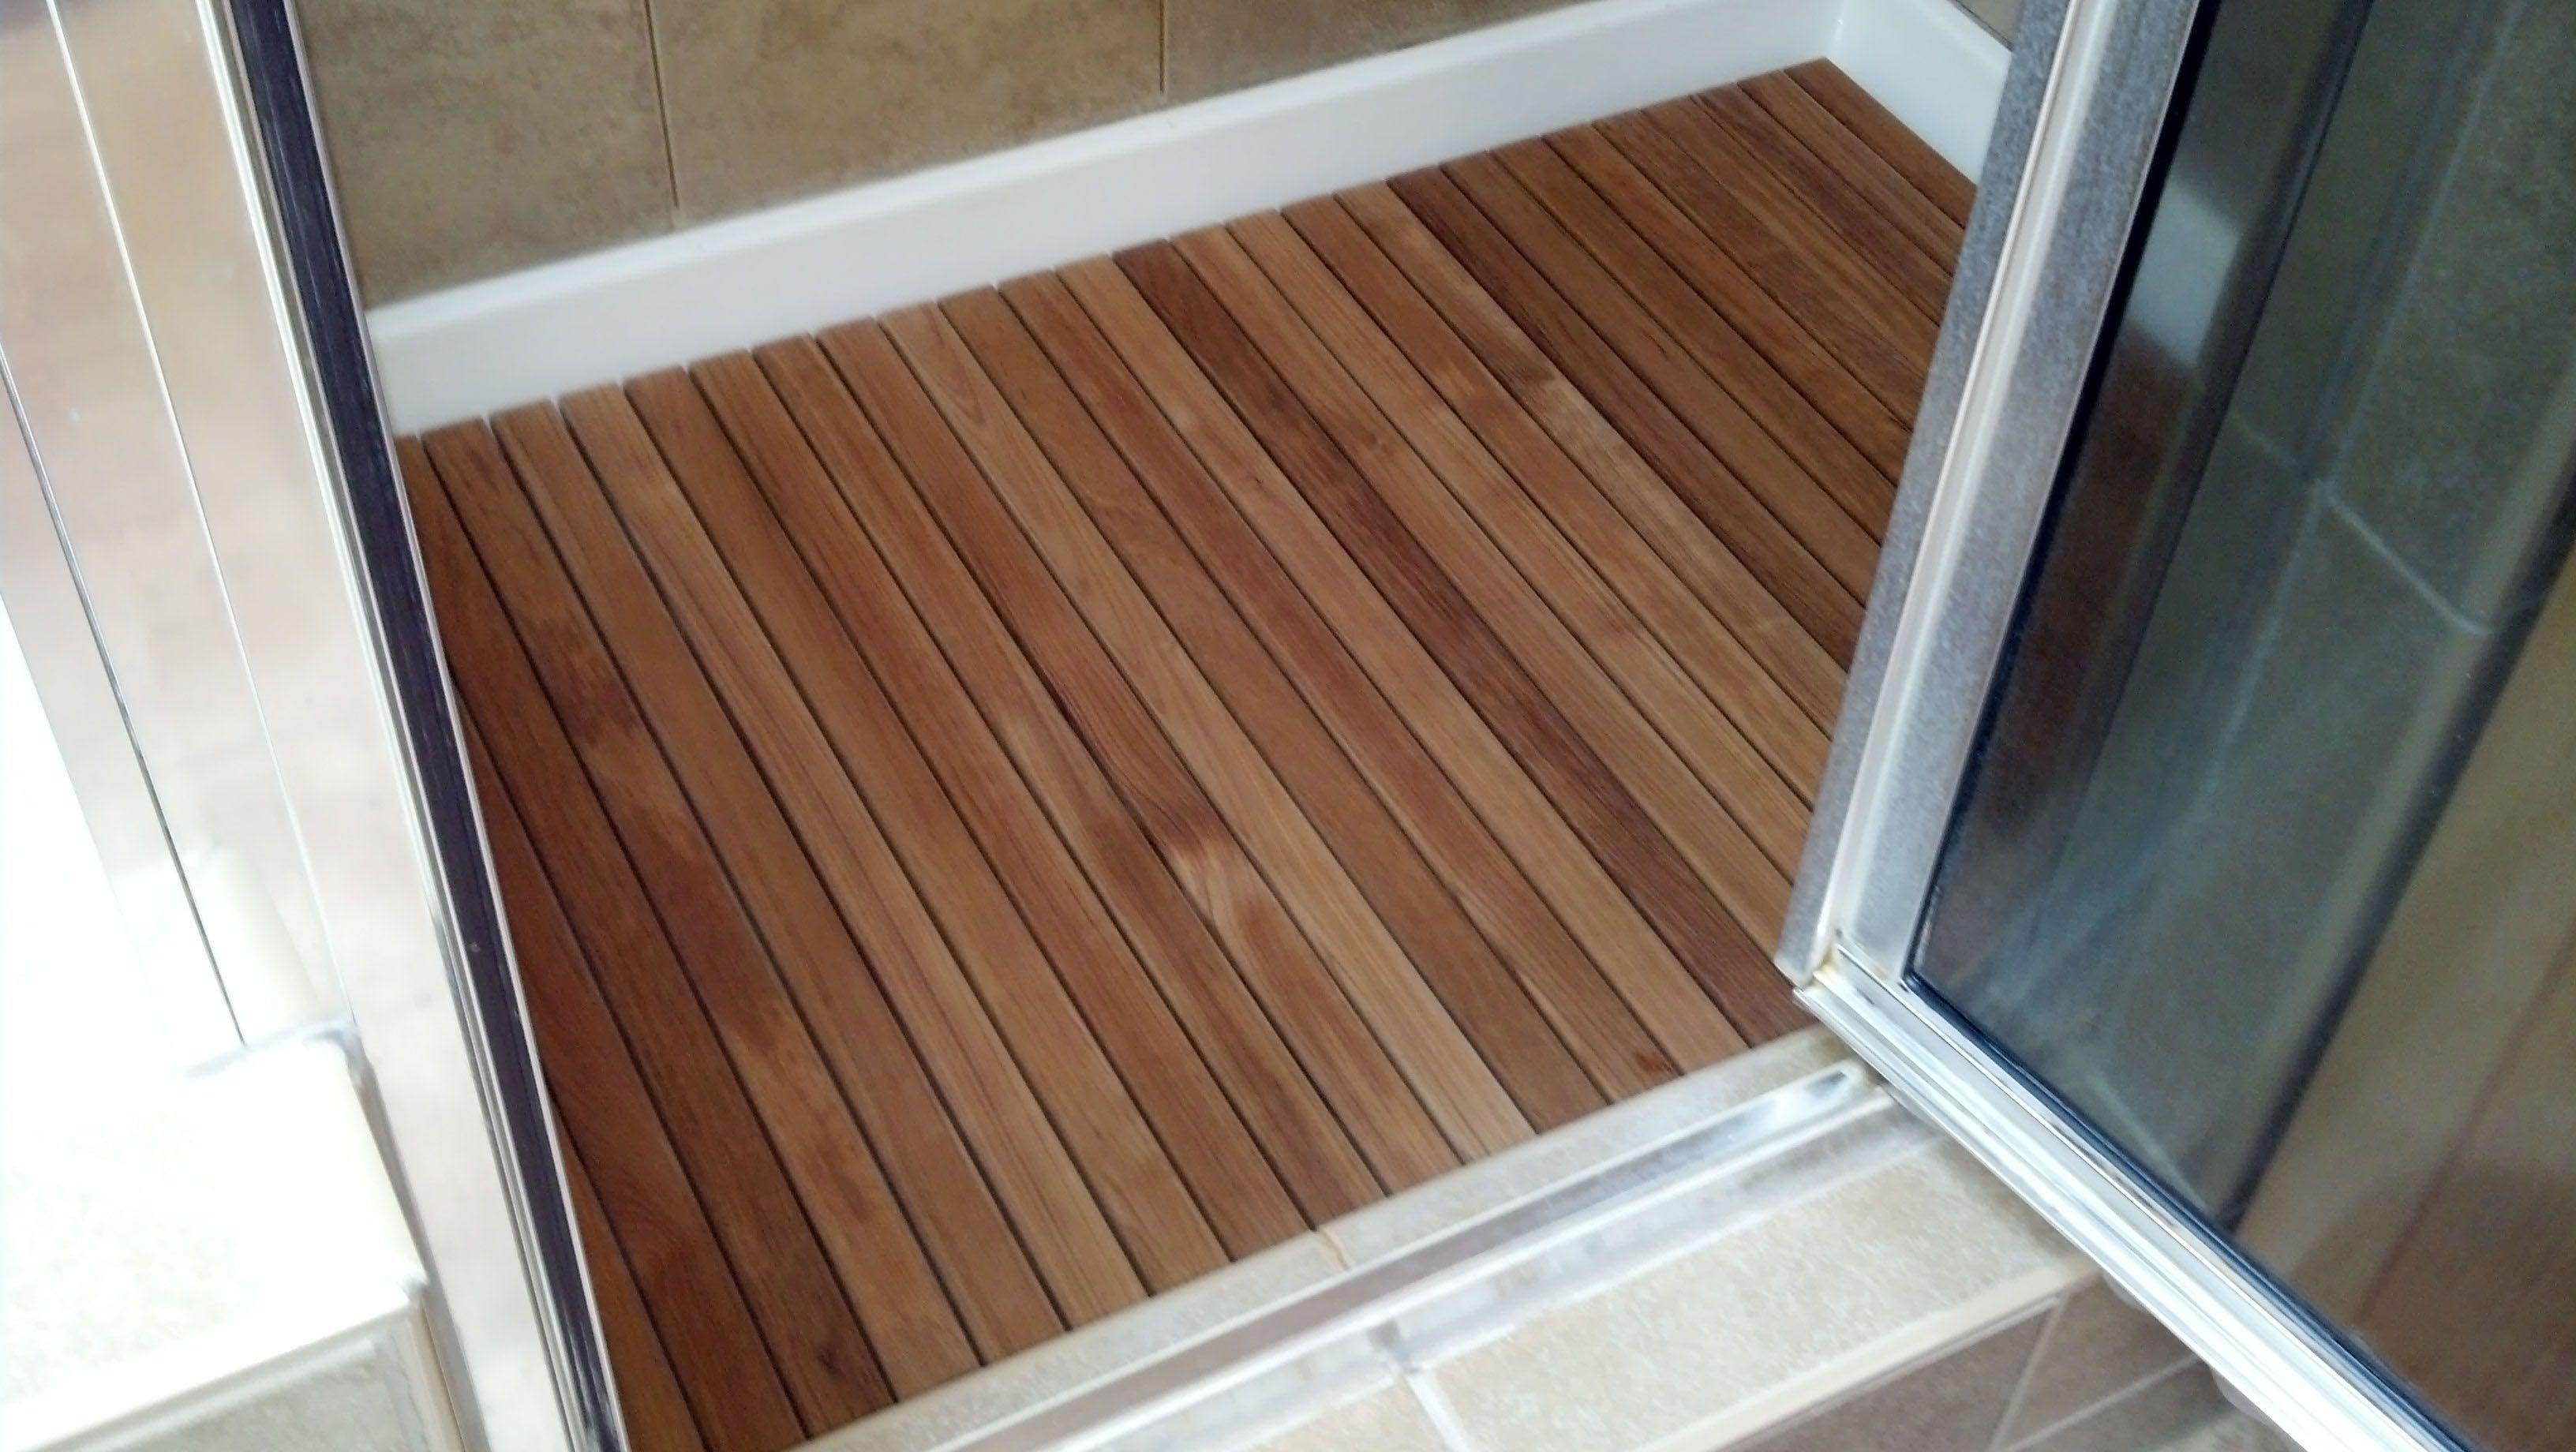 Teak Shower Flooring Google Search Building A Shower Pan Shower Floor Wood Shower Bench